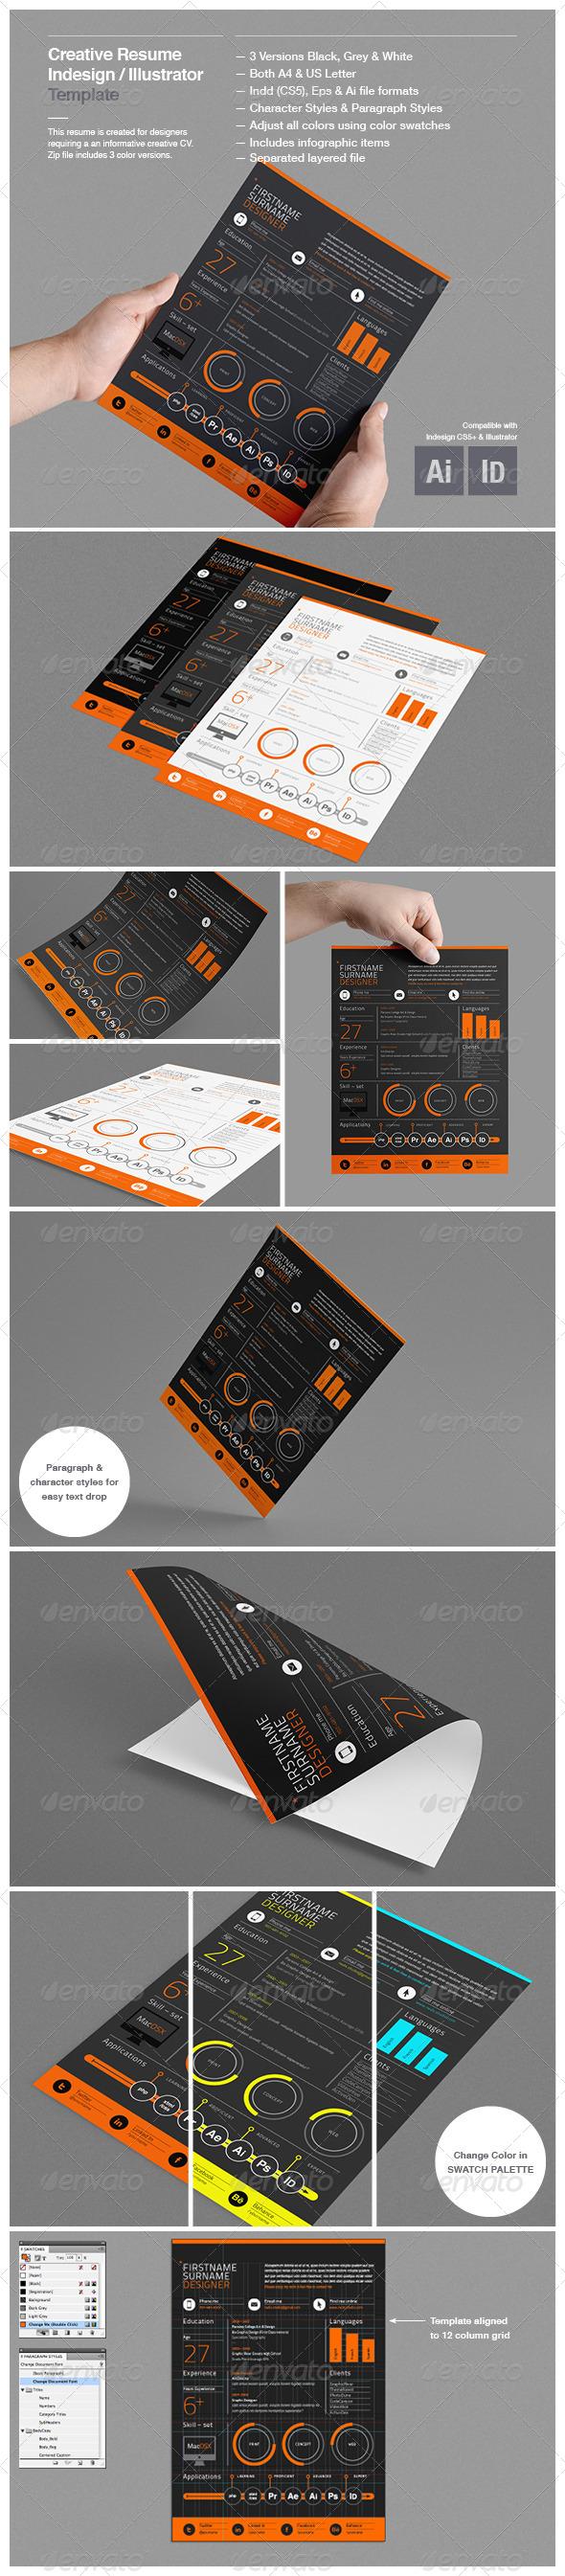 GraphicRiver Creative Resume Template 4325670